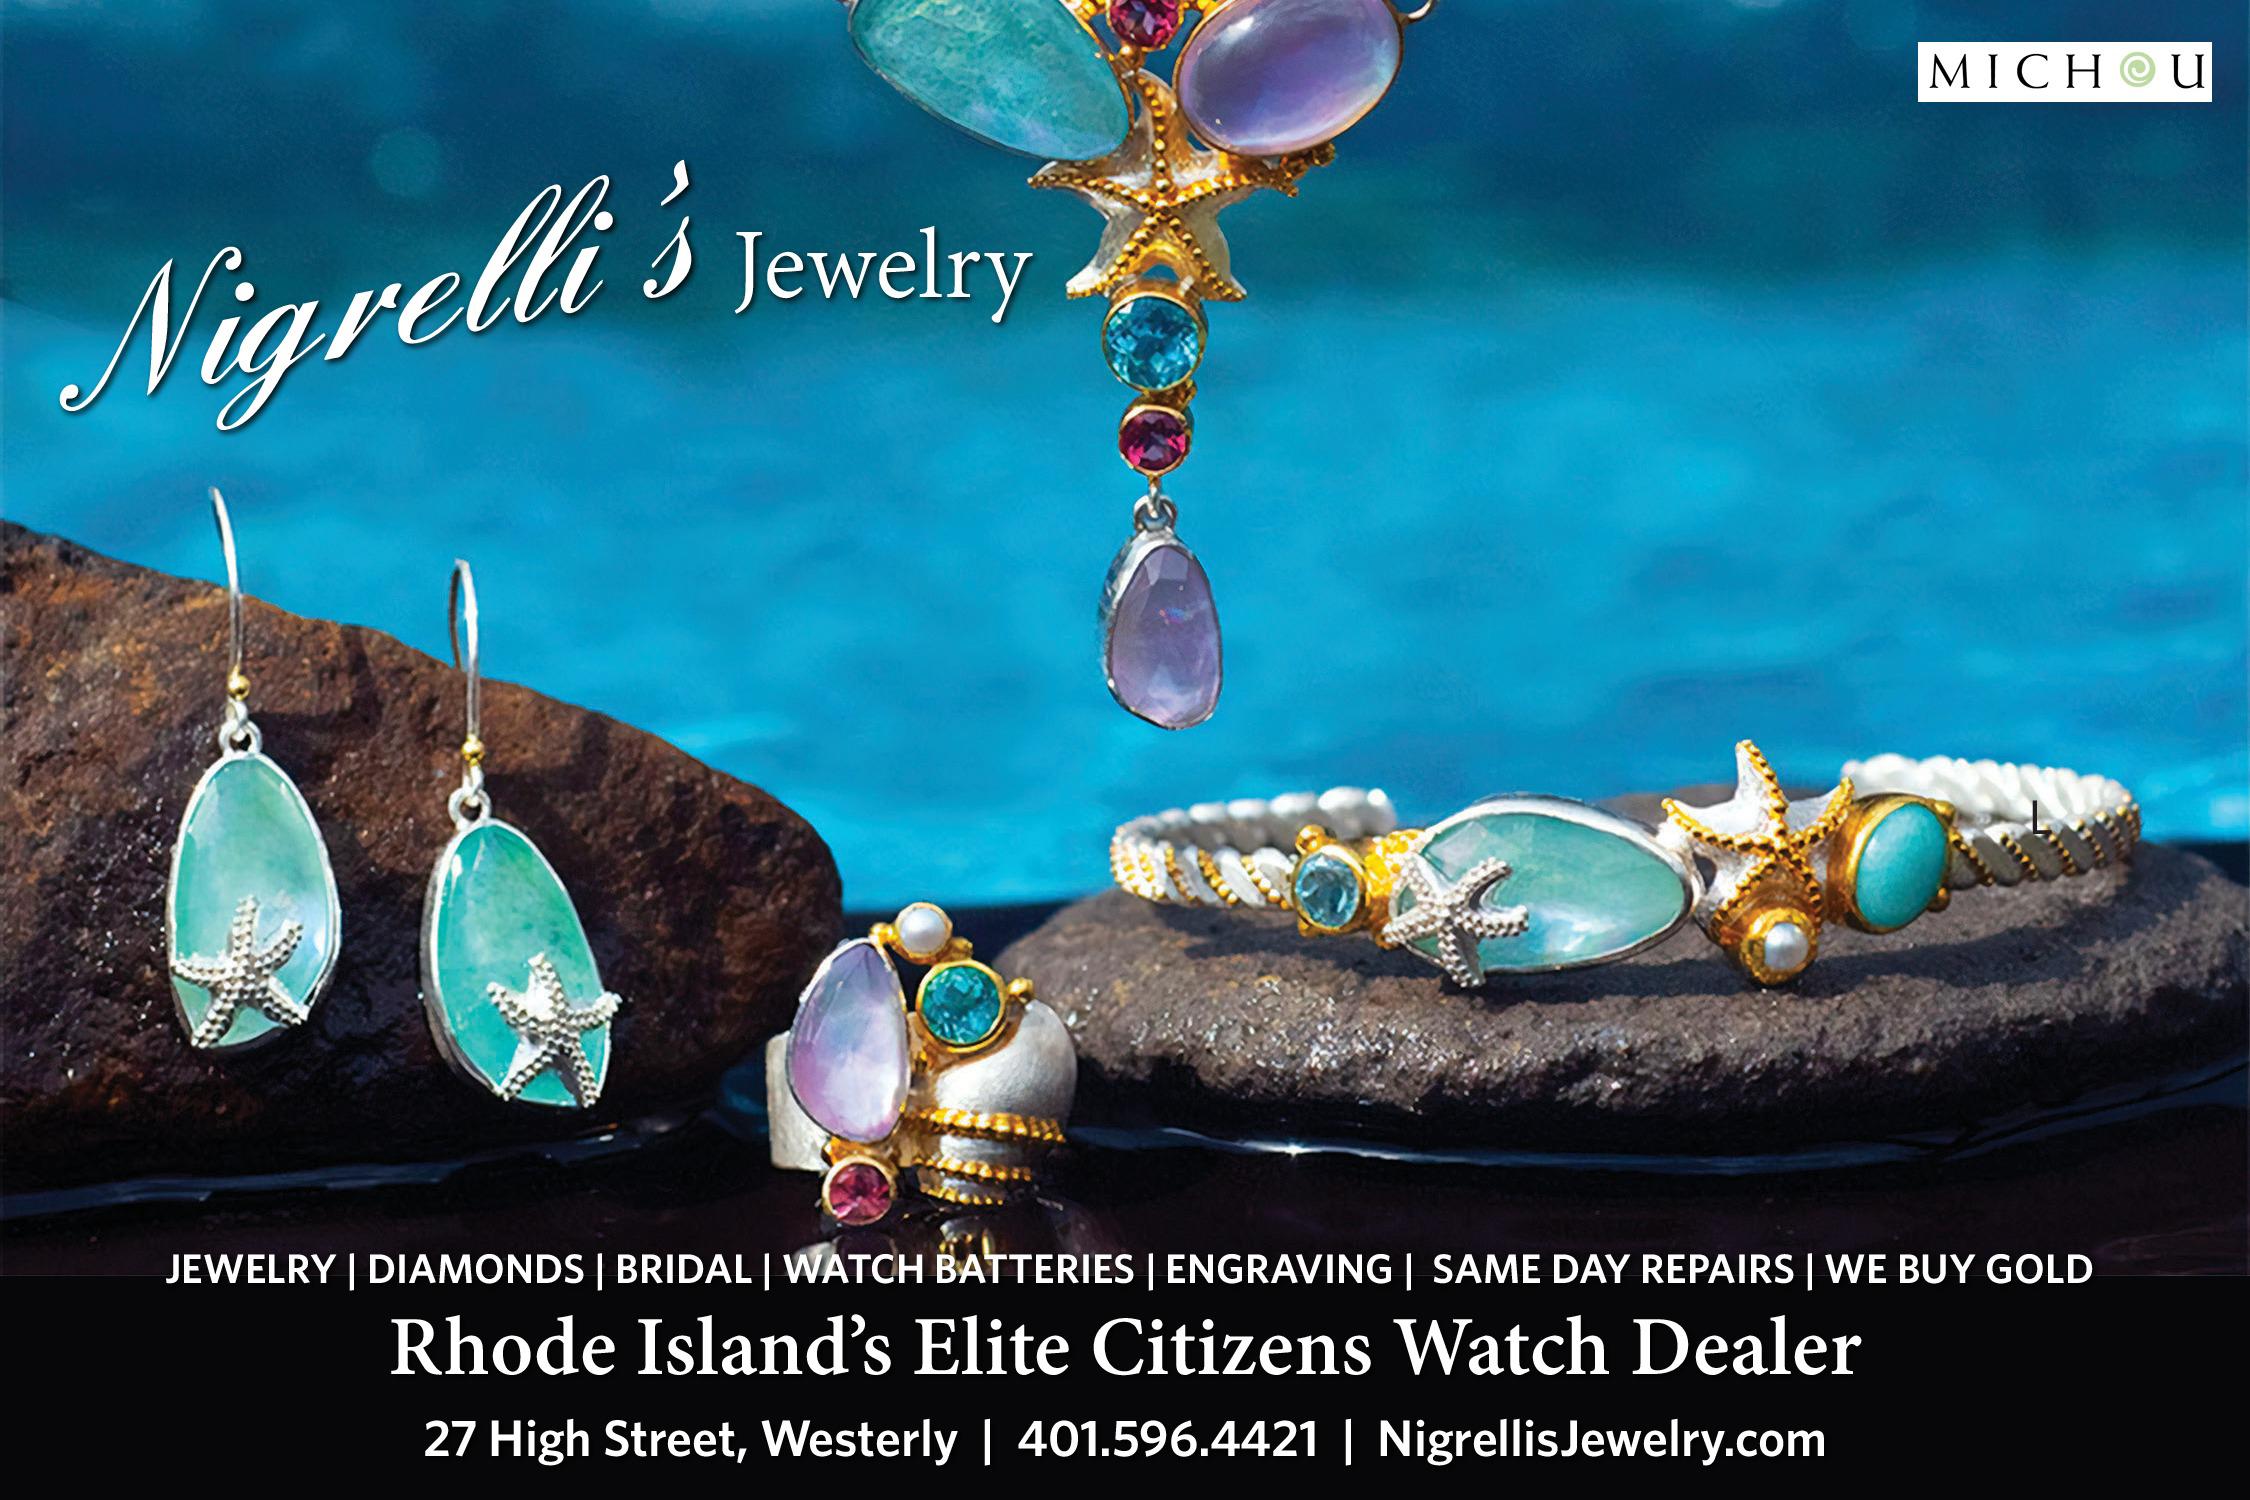 18++ Nigrellis jewelry westerly ri info